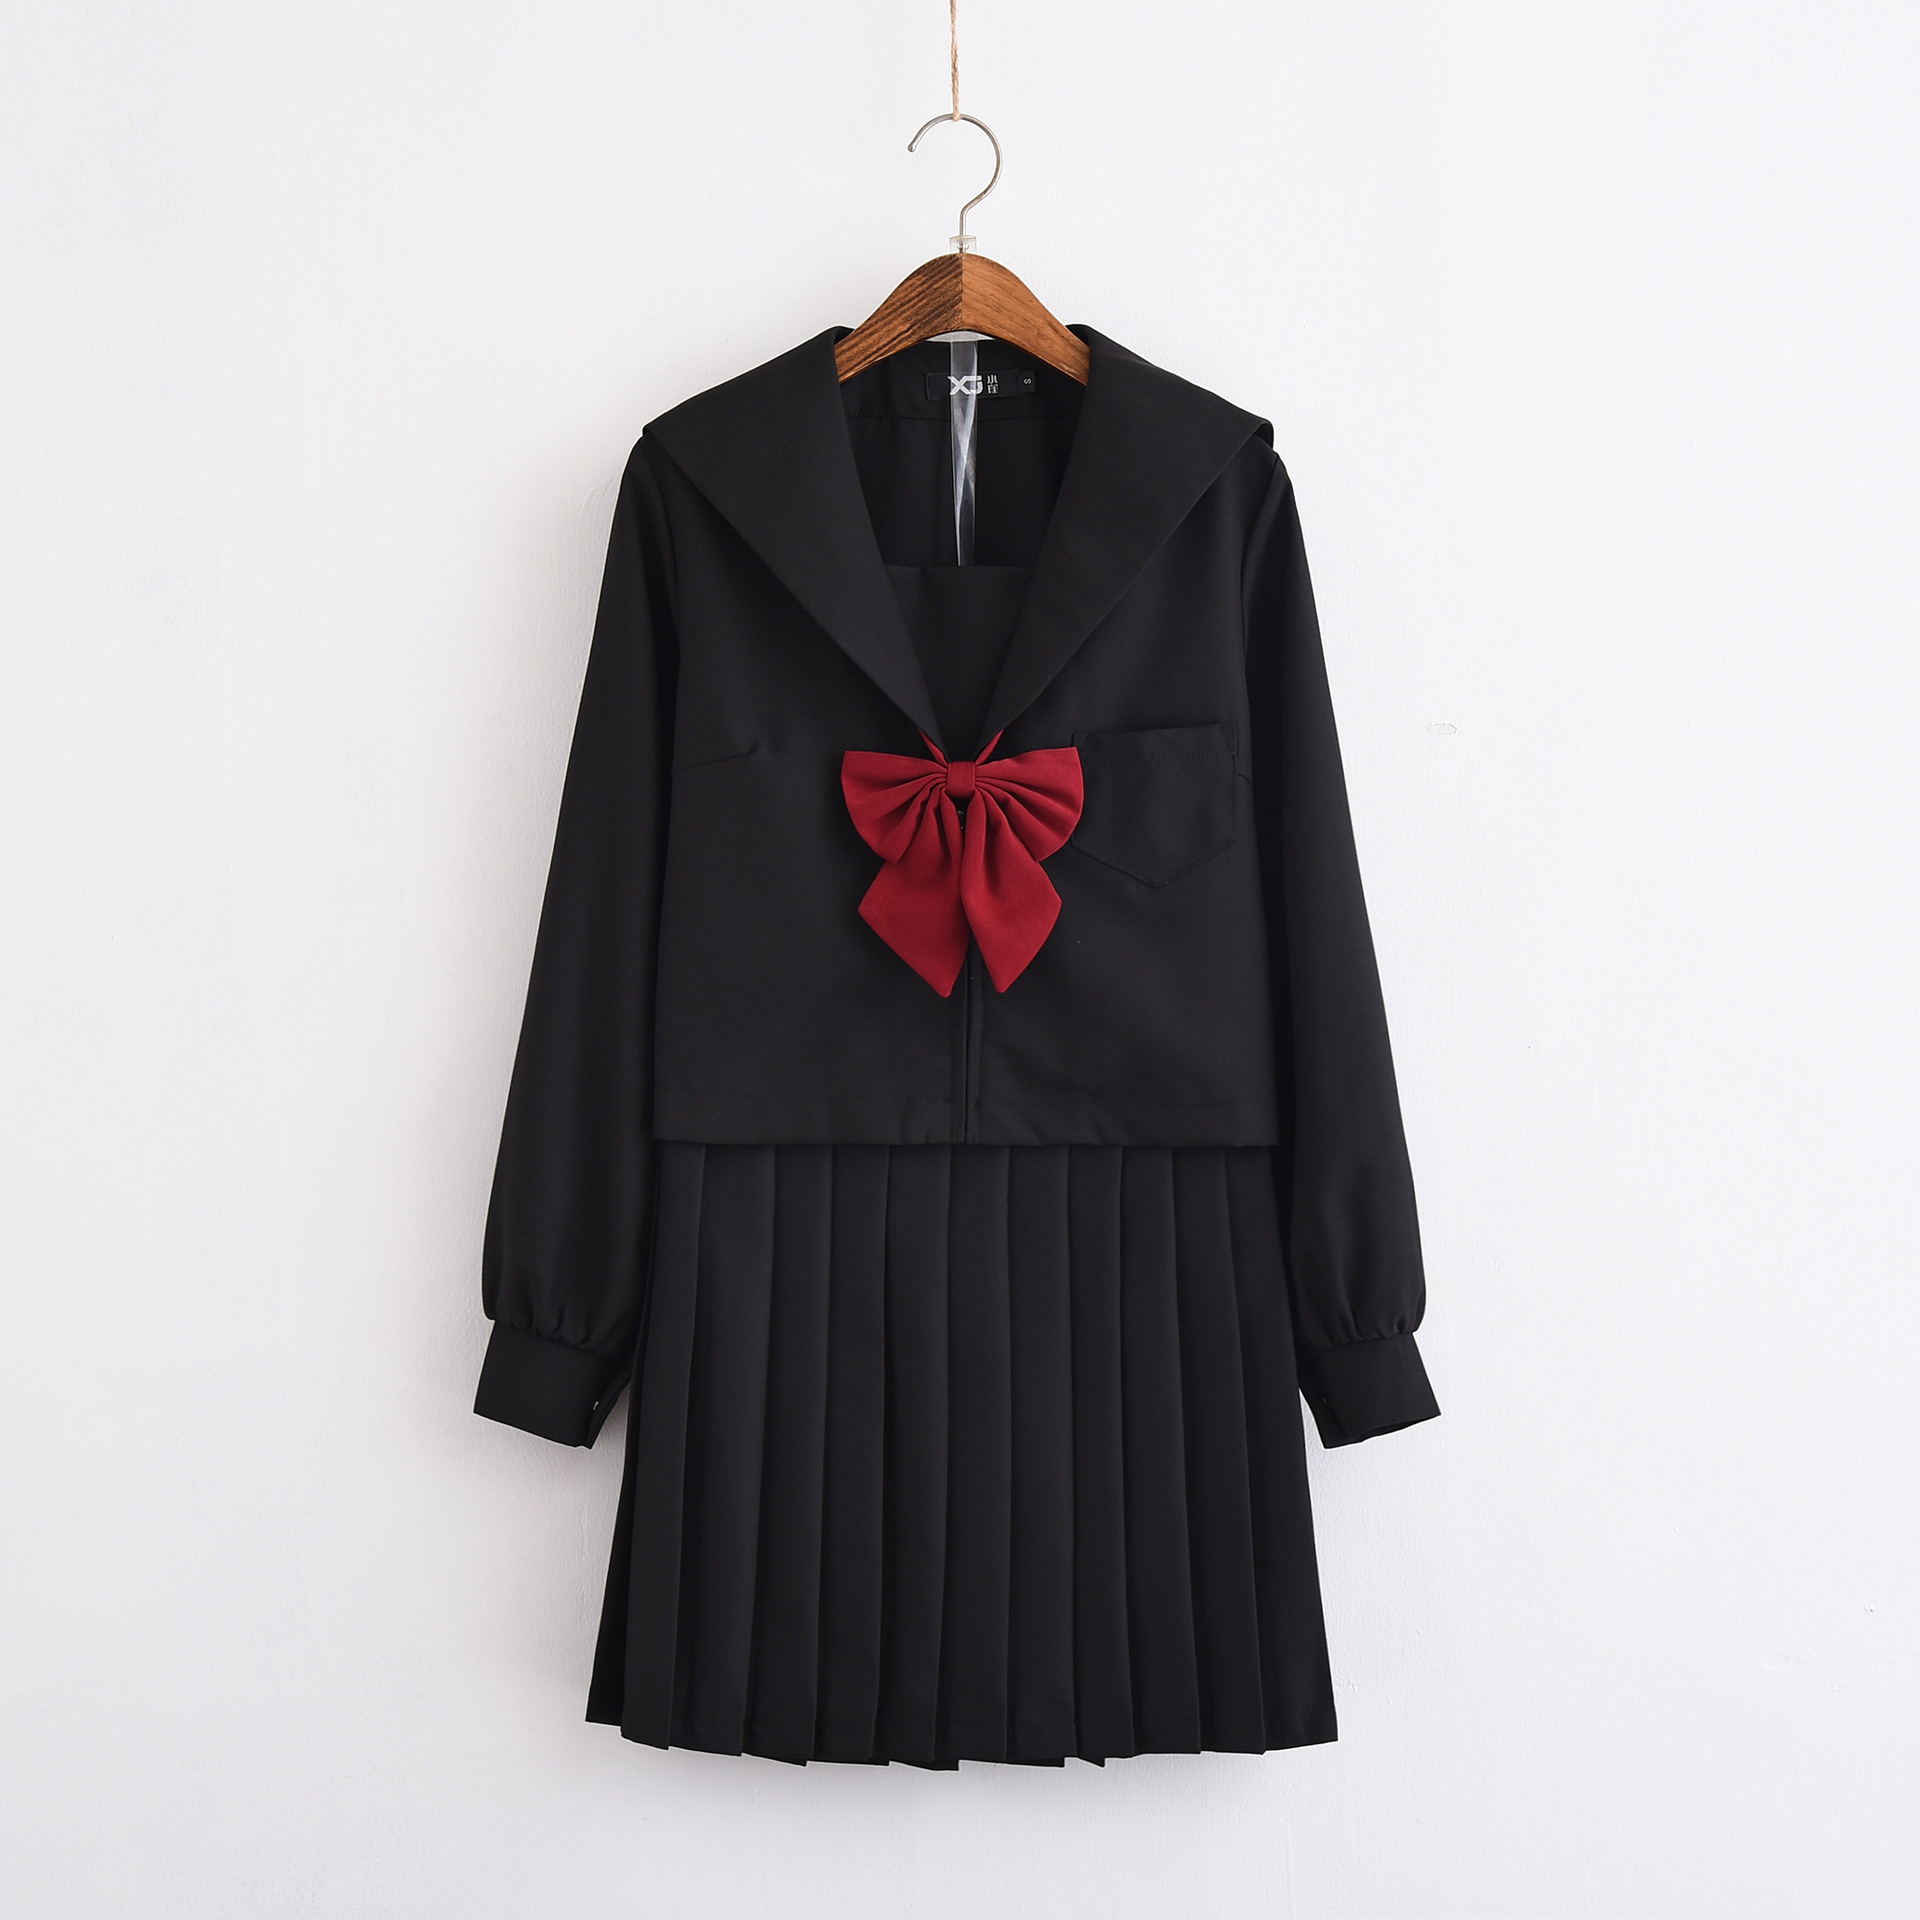 Japan Jk Long Sleeve Sets School Uniform Girls Small Fresh Autumn High School Women Novelty Sailor Suits Uniforms S/M/L/XL/XXL